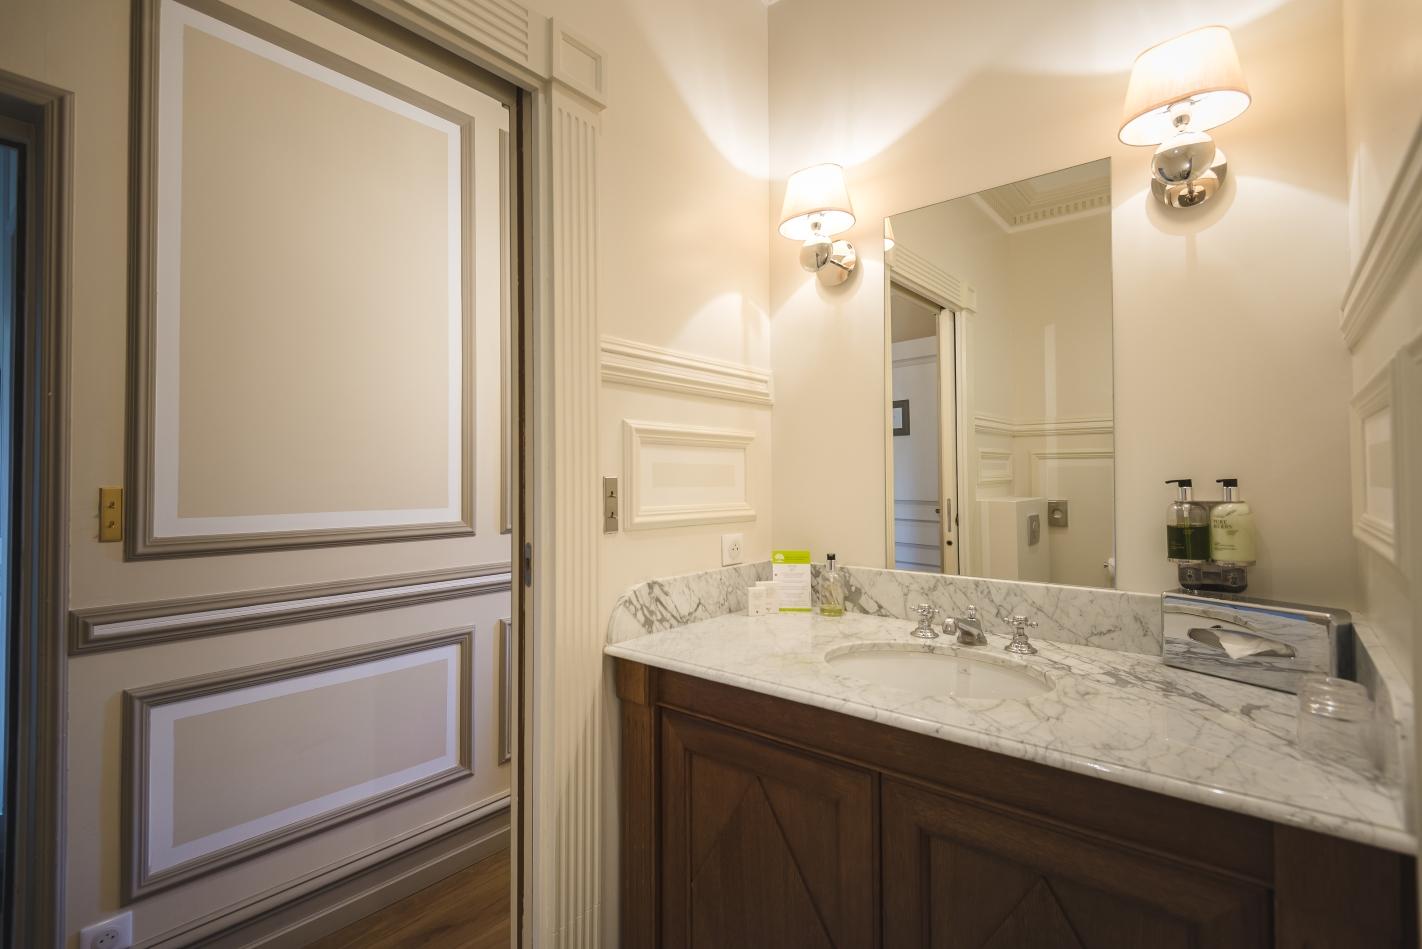 Villa Victor Louis - Chambre Classique - Salle de bain en marbre